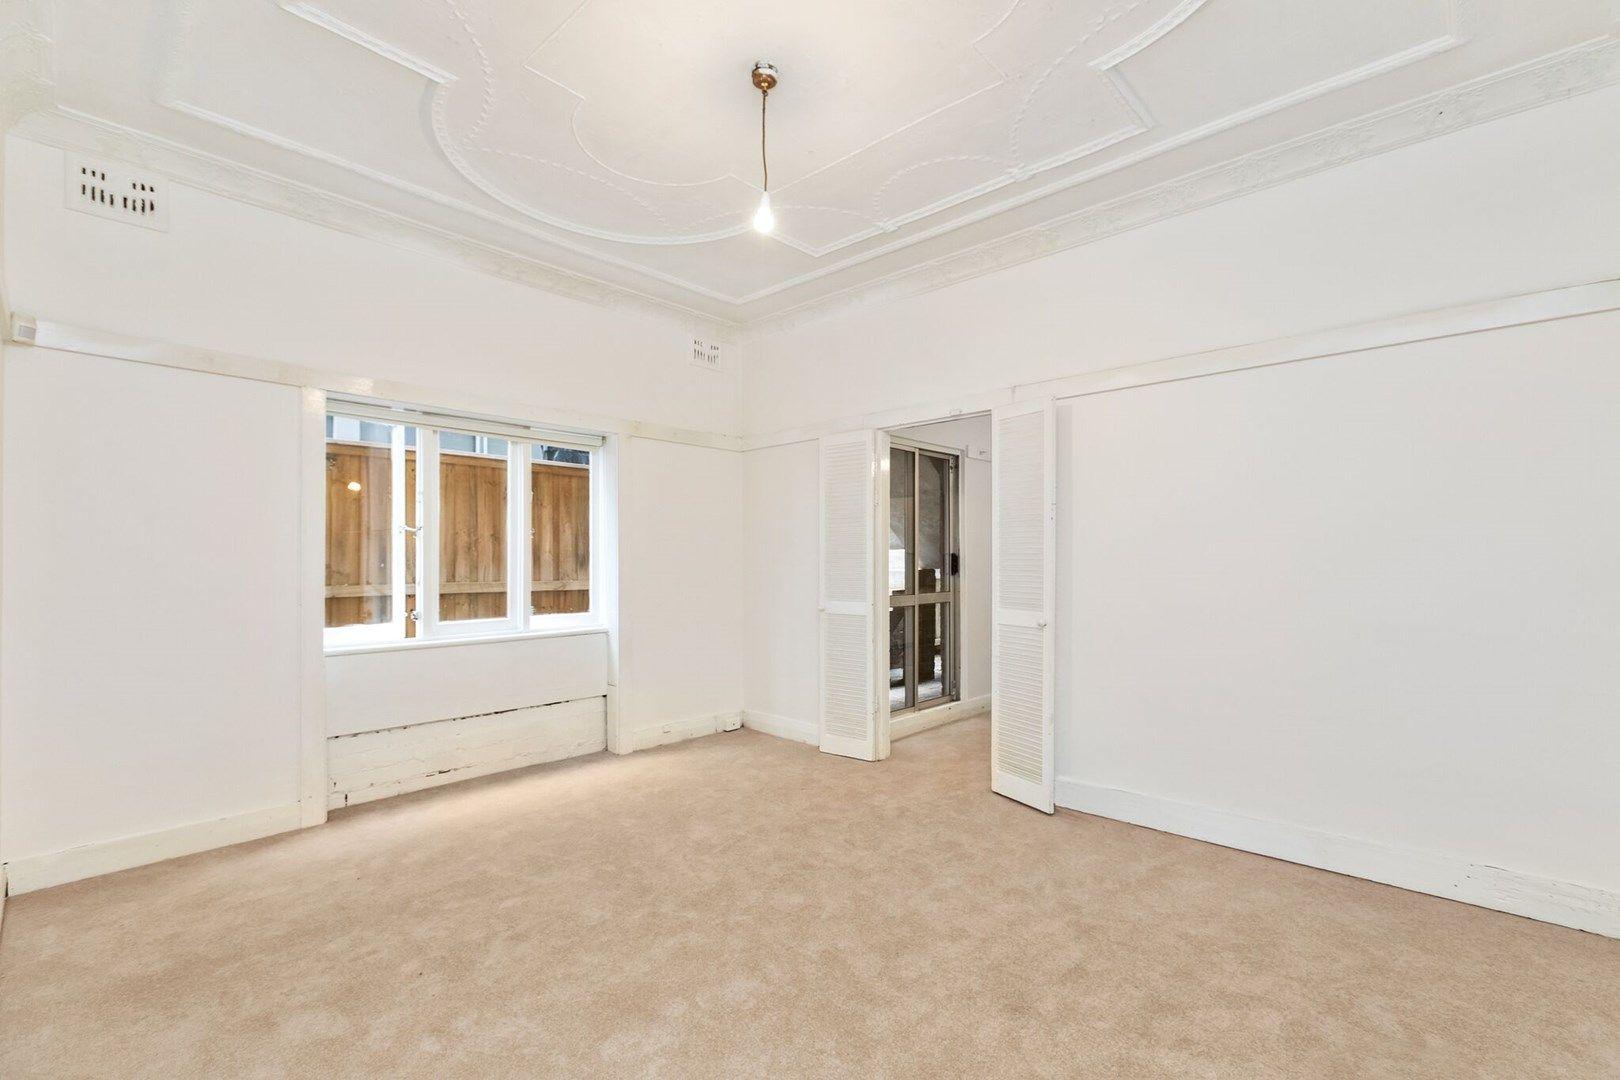 1/30 Lawson St, Bondi Junction NSW 2022, Image 0